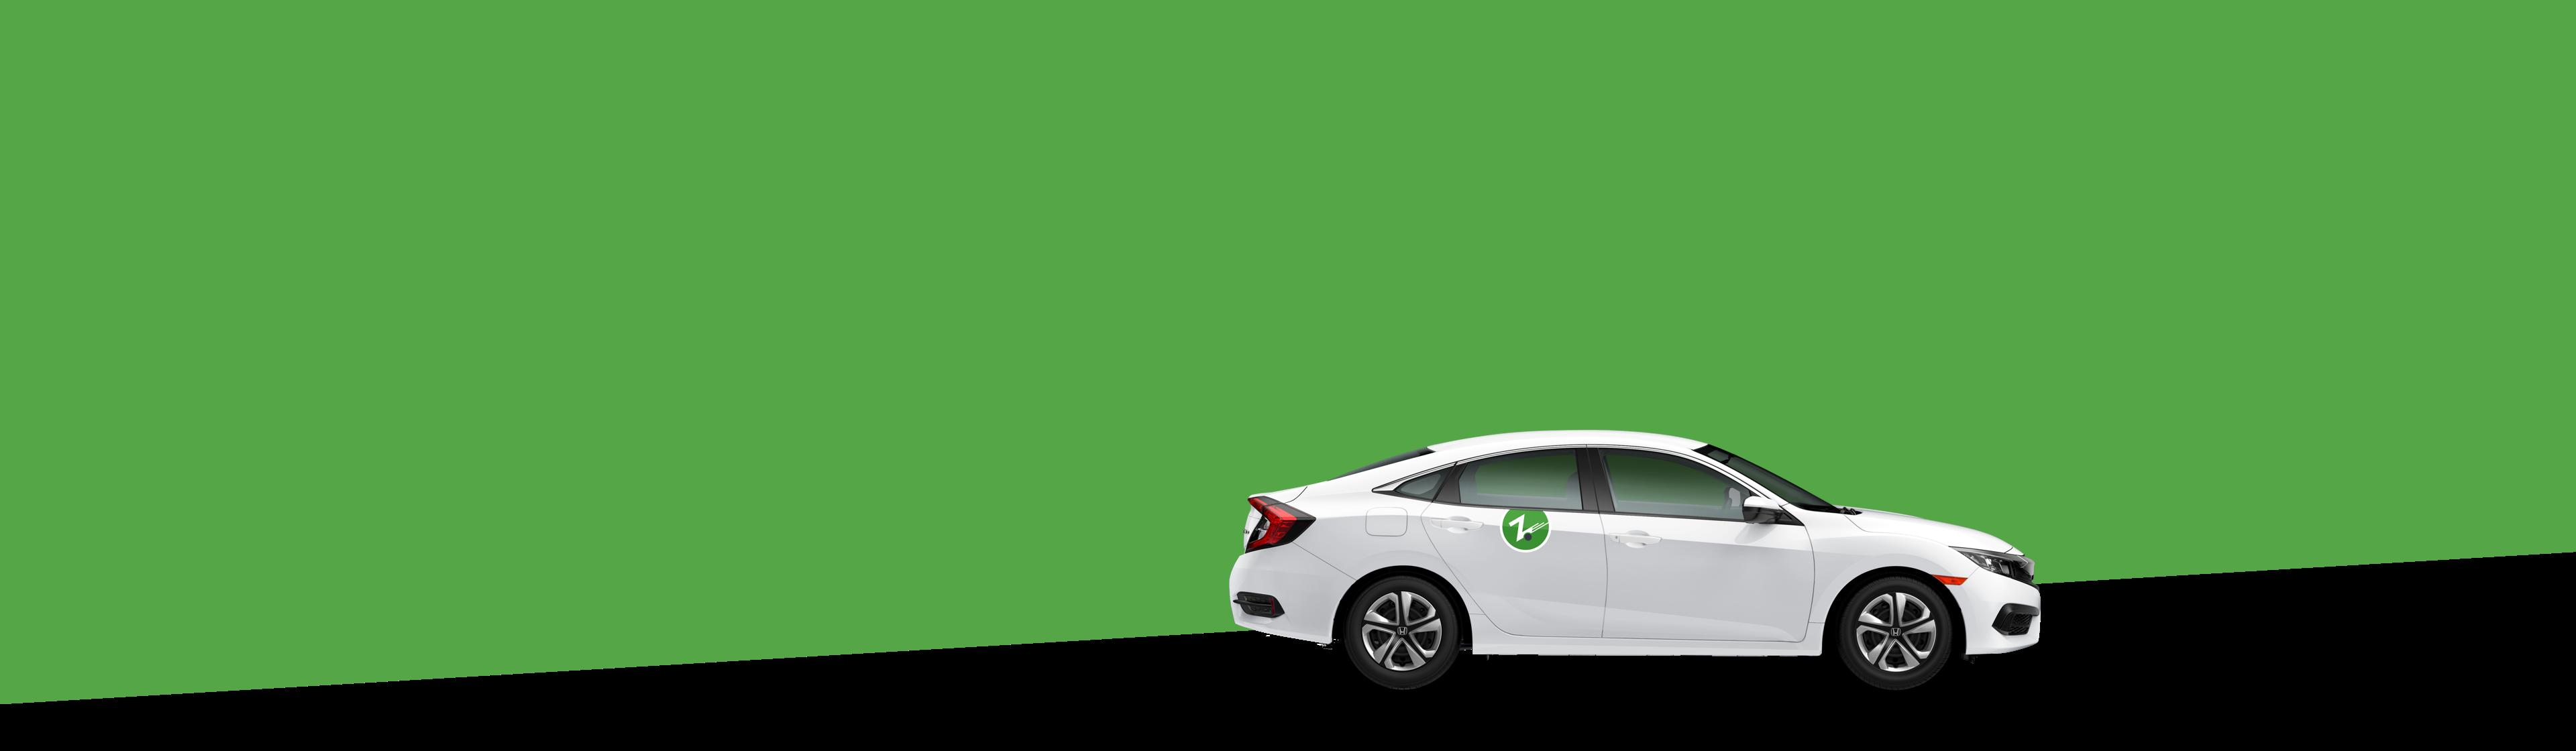 green-background-white-zipcar